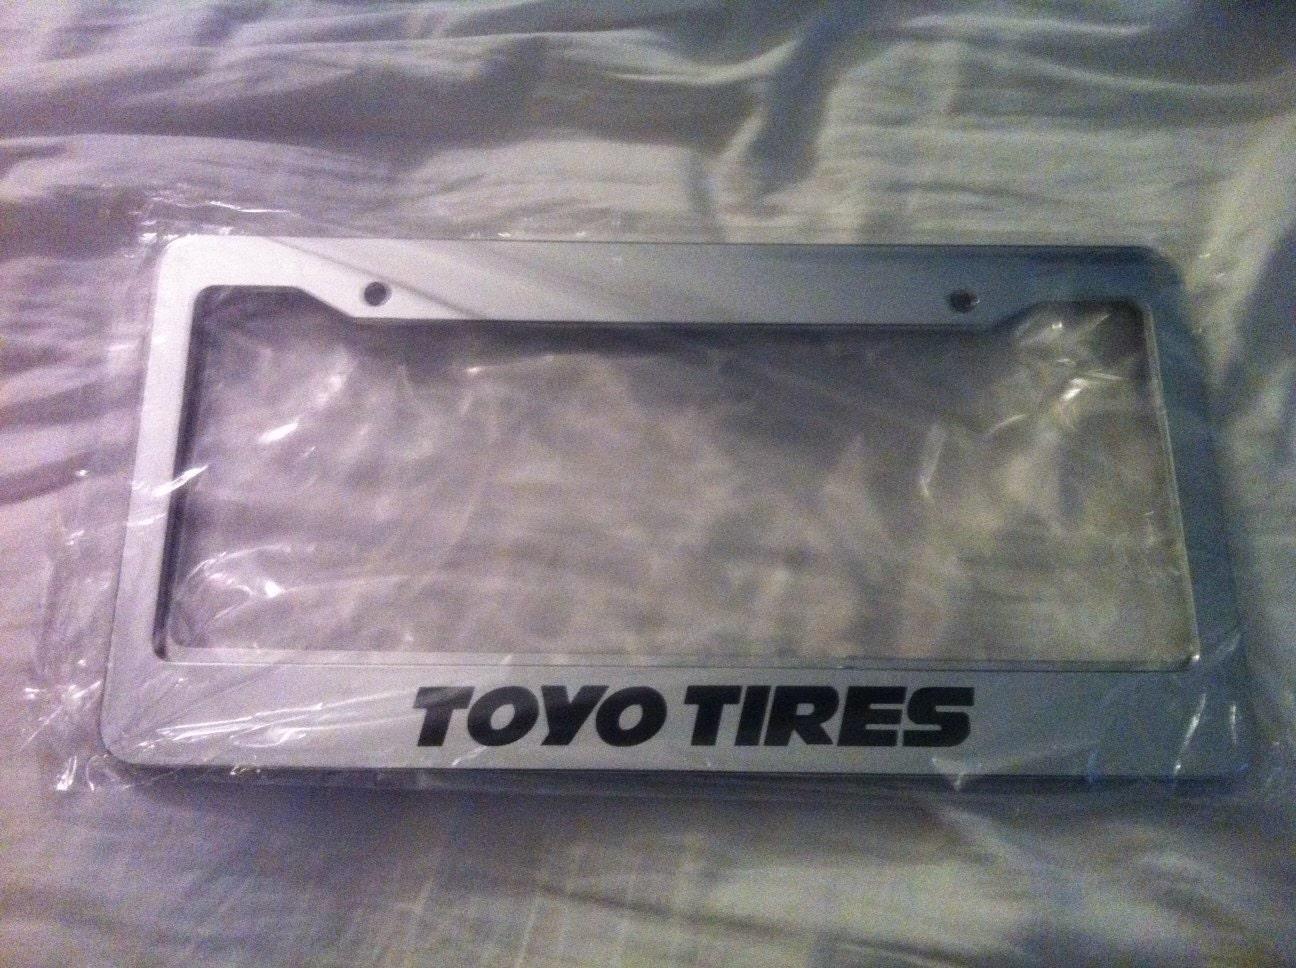 Toyo Tires Chrom Kfz Kennzeichenhalter Jdm Style Racing